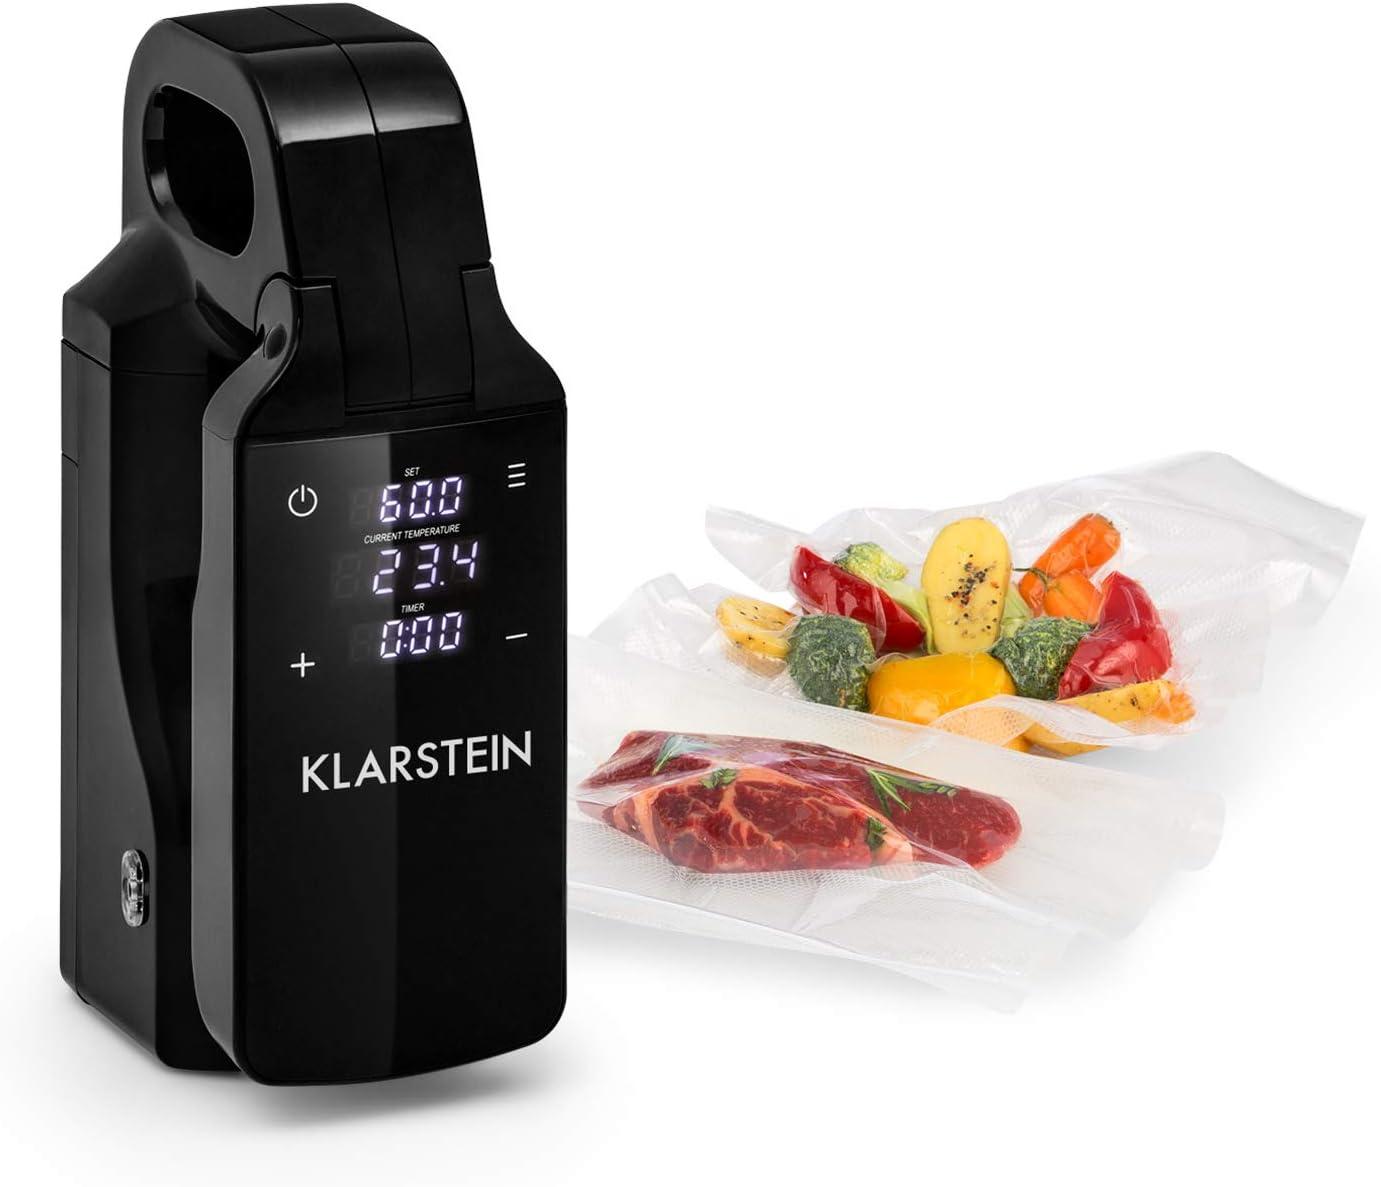 Klarstein Quickstick Free Sous Vide Stick Black Edition - Cocina al vacío, Bomba de cocción, Temperatura 0-95 °C, 800 W de potencia, Display LCD táctil, Safety First Technology, Seguridad IPX7, Negro